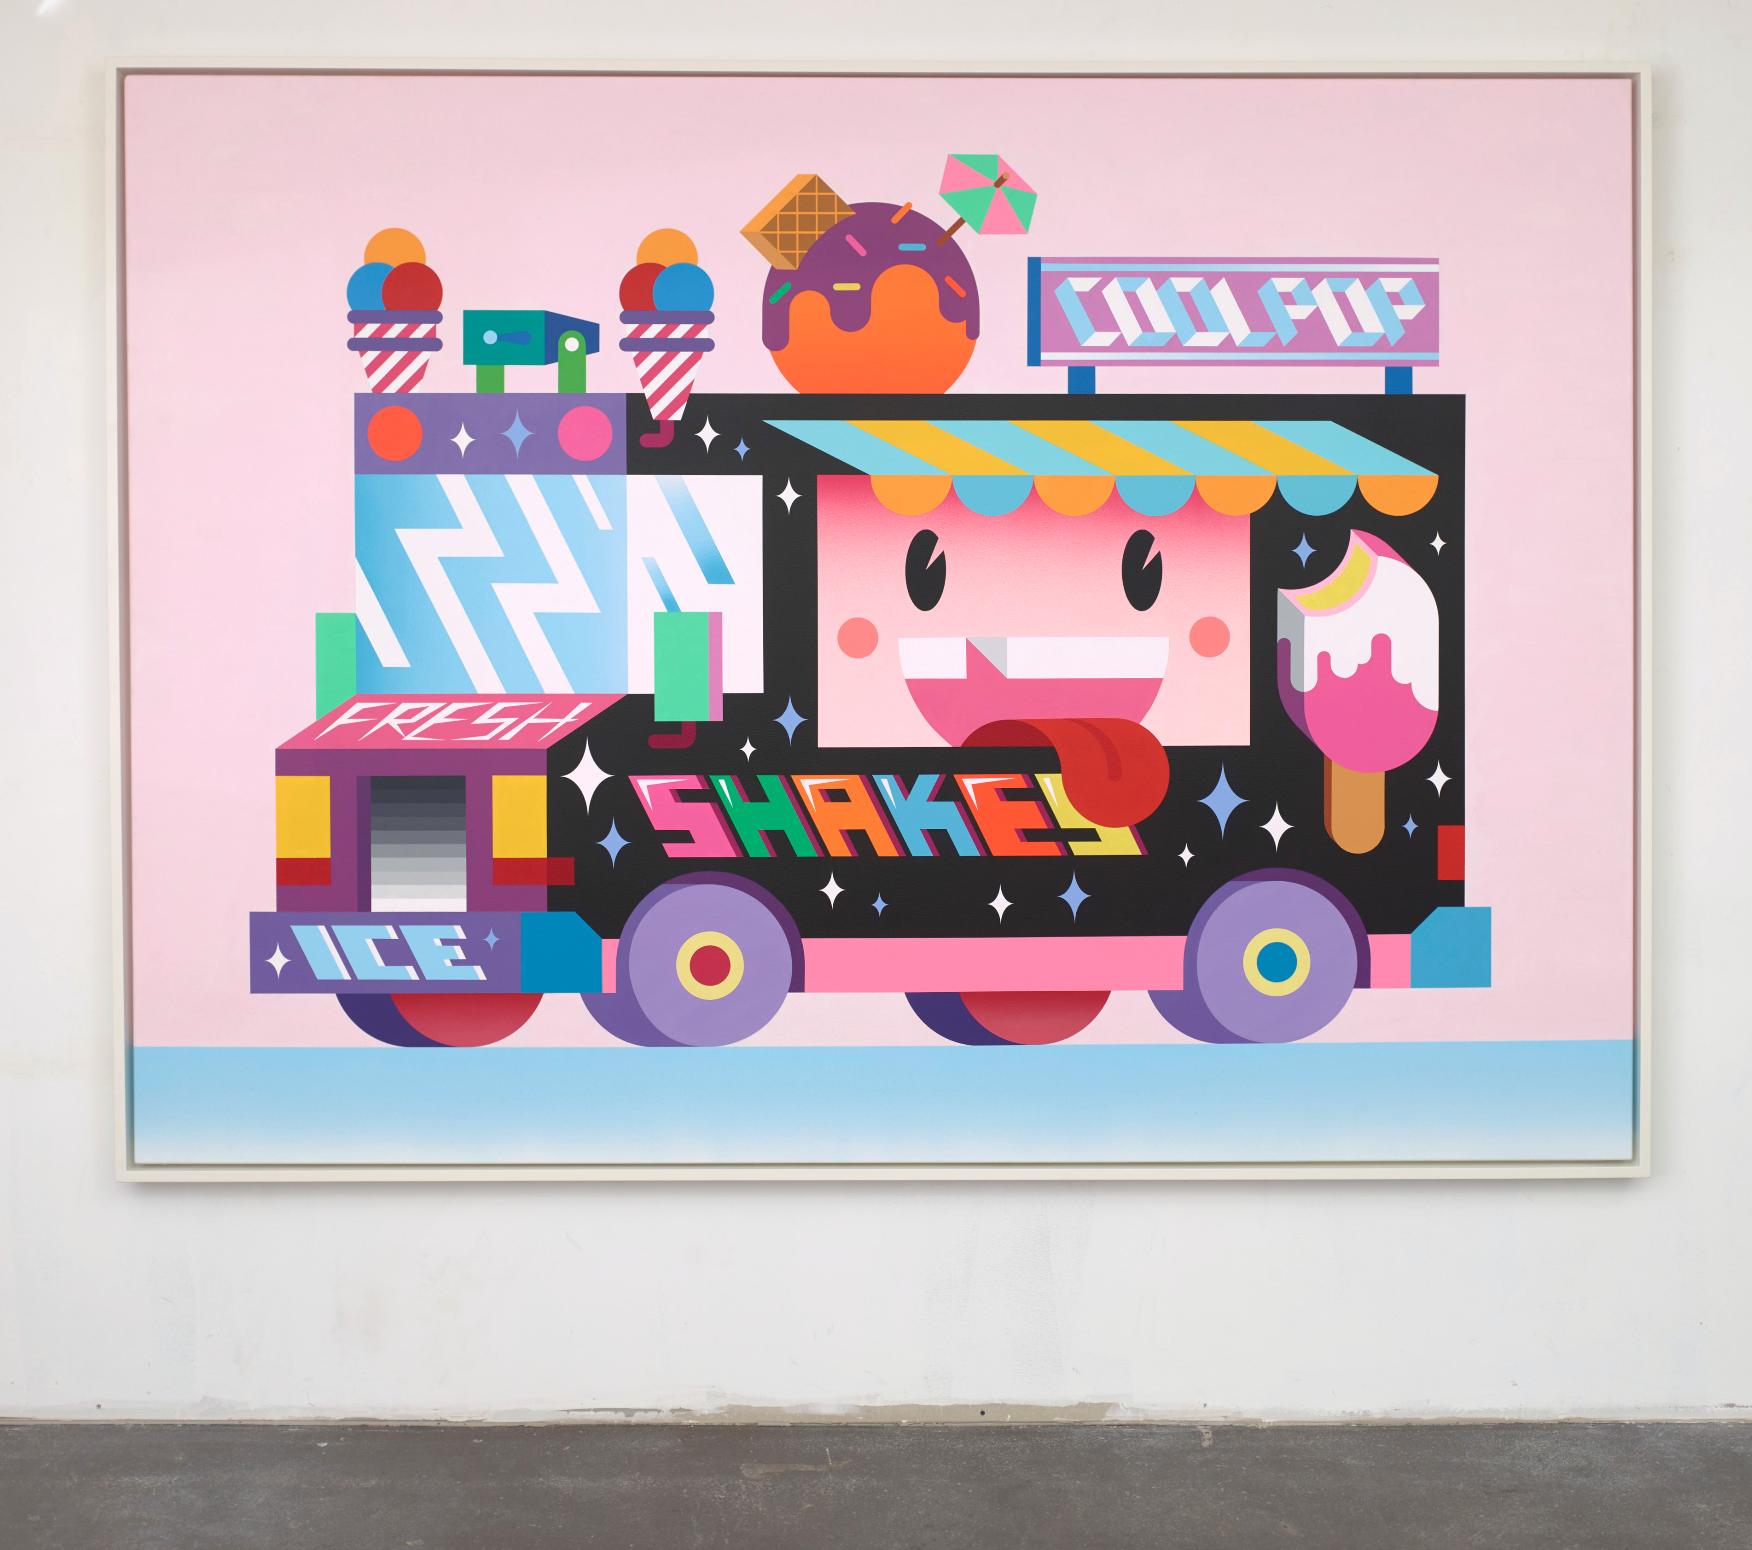 Doppeldenk | Affenfaust Galerie